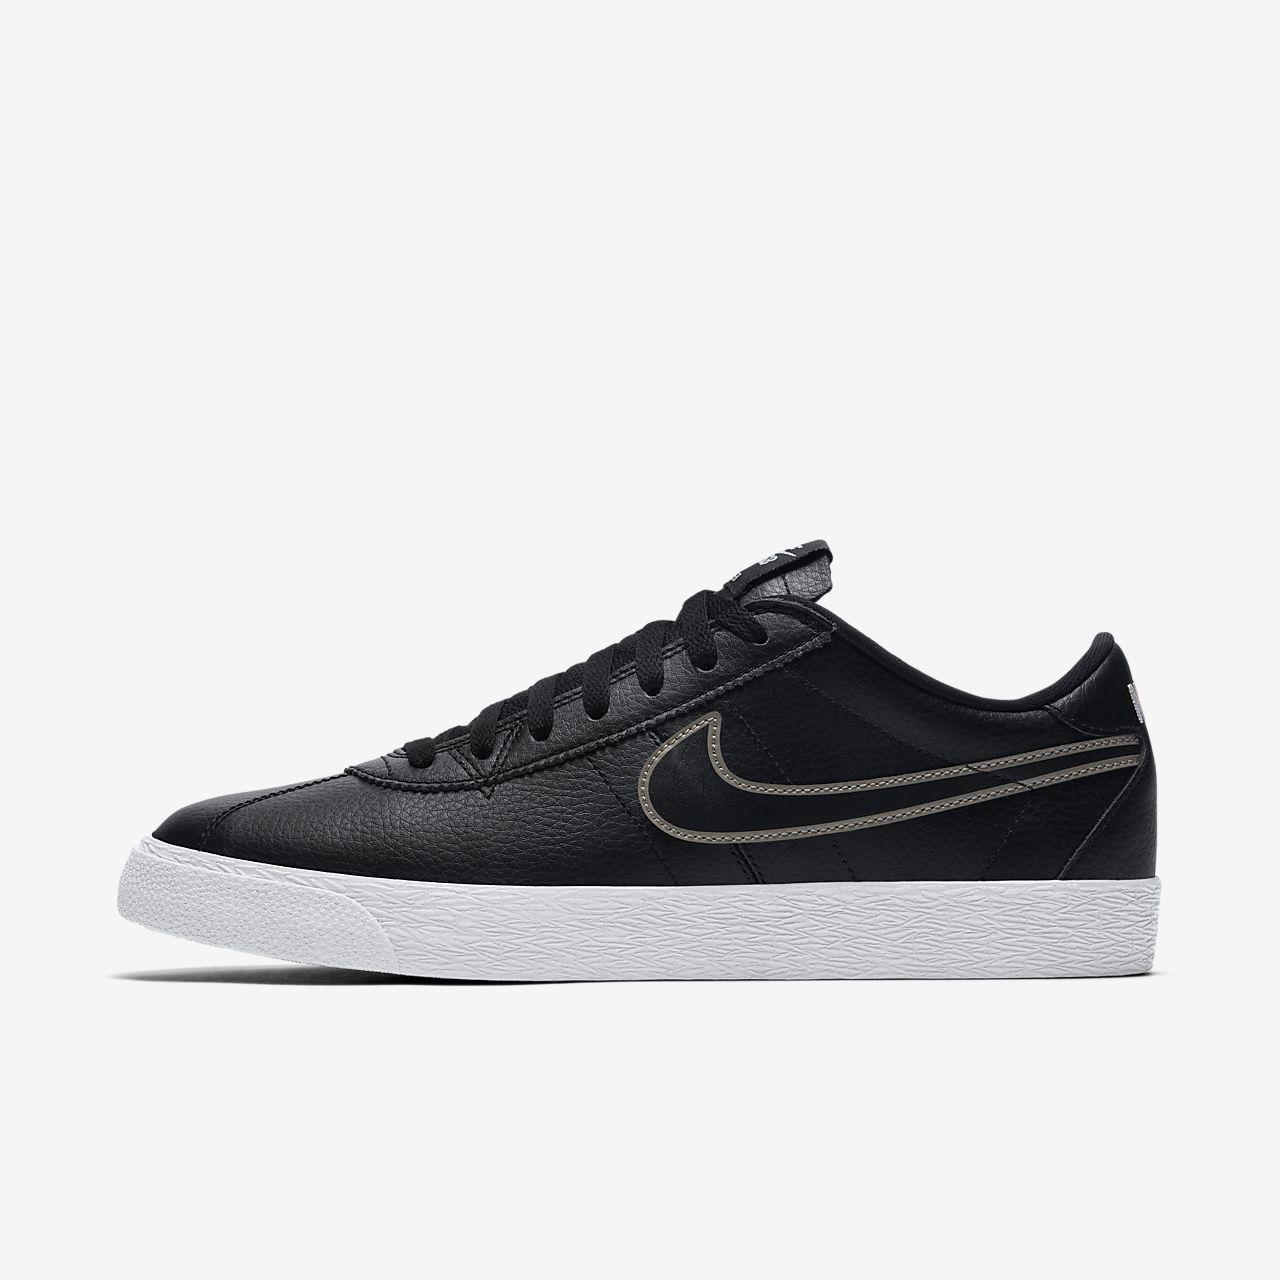 Nike SB Bruin Premium